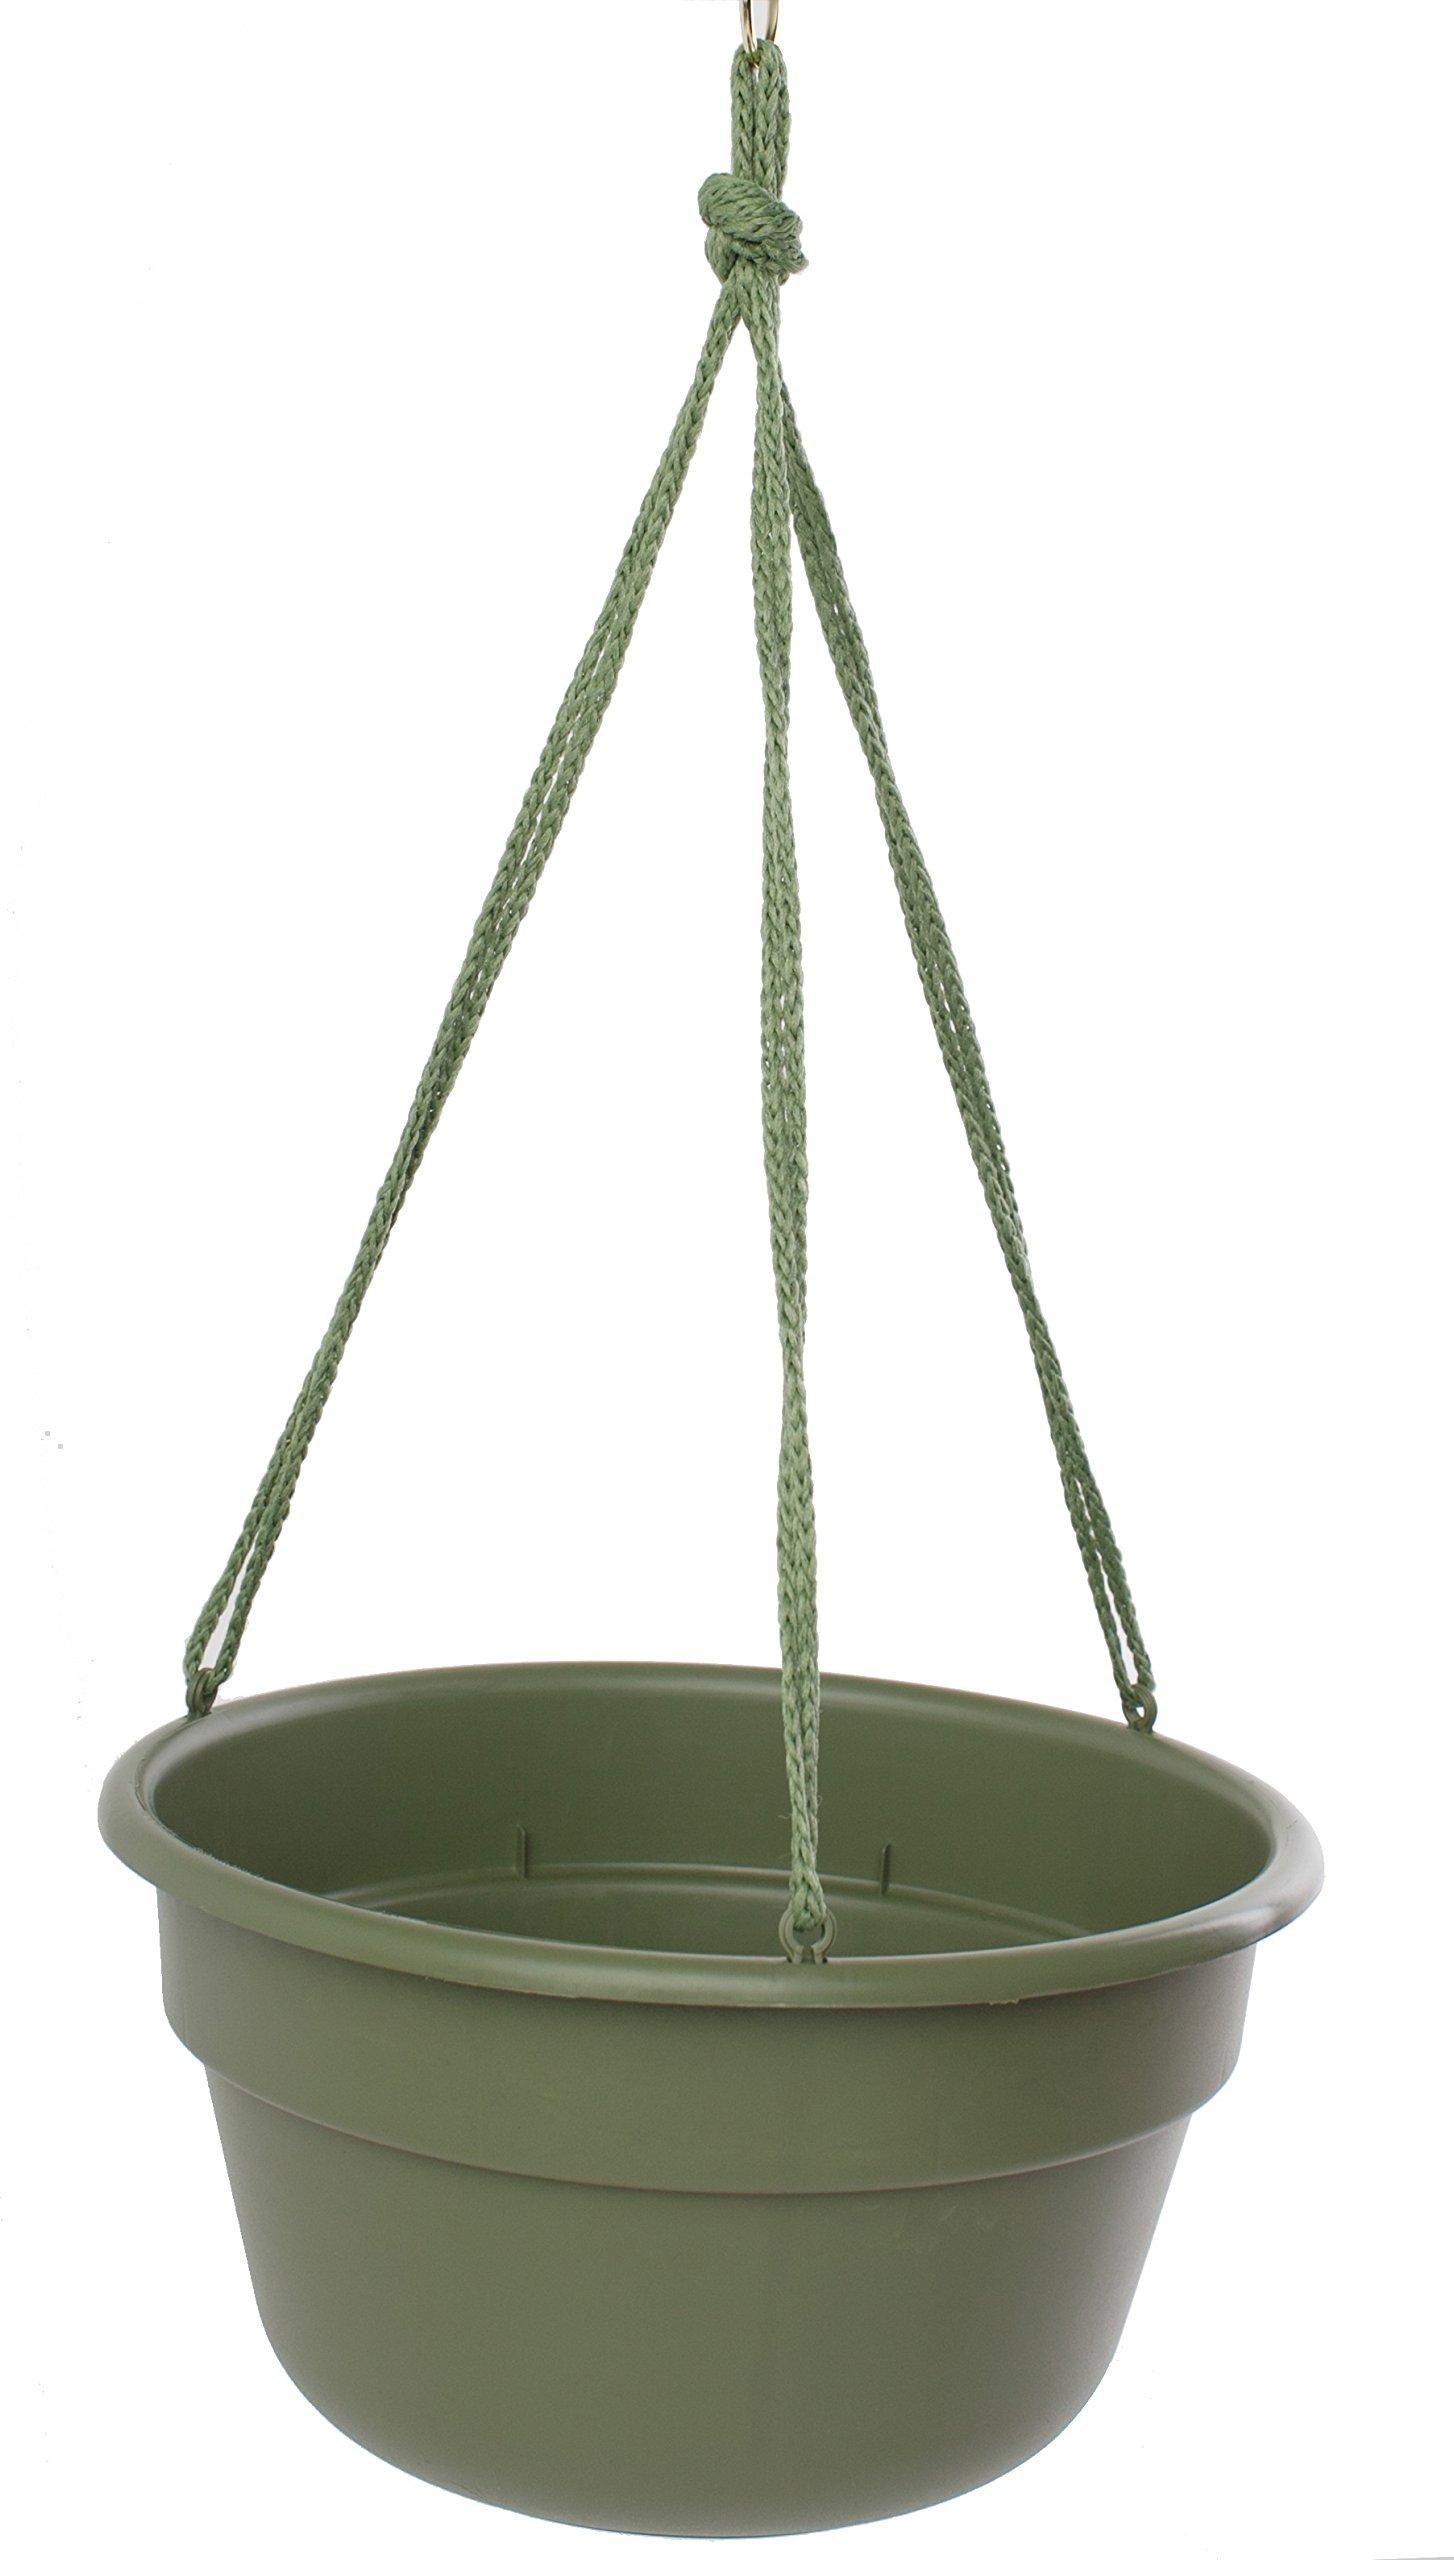 Bloem DCHB1242-12 12-Pack Dura Cotta Hanging Basket/Planter, 12-Inch, Living Green by Bloem